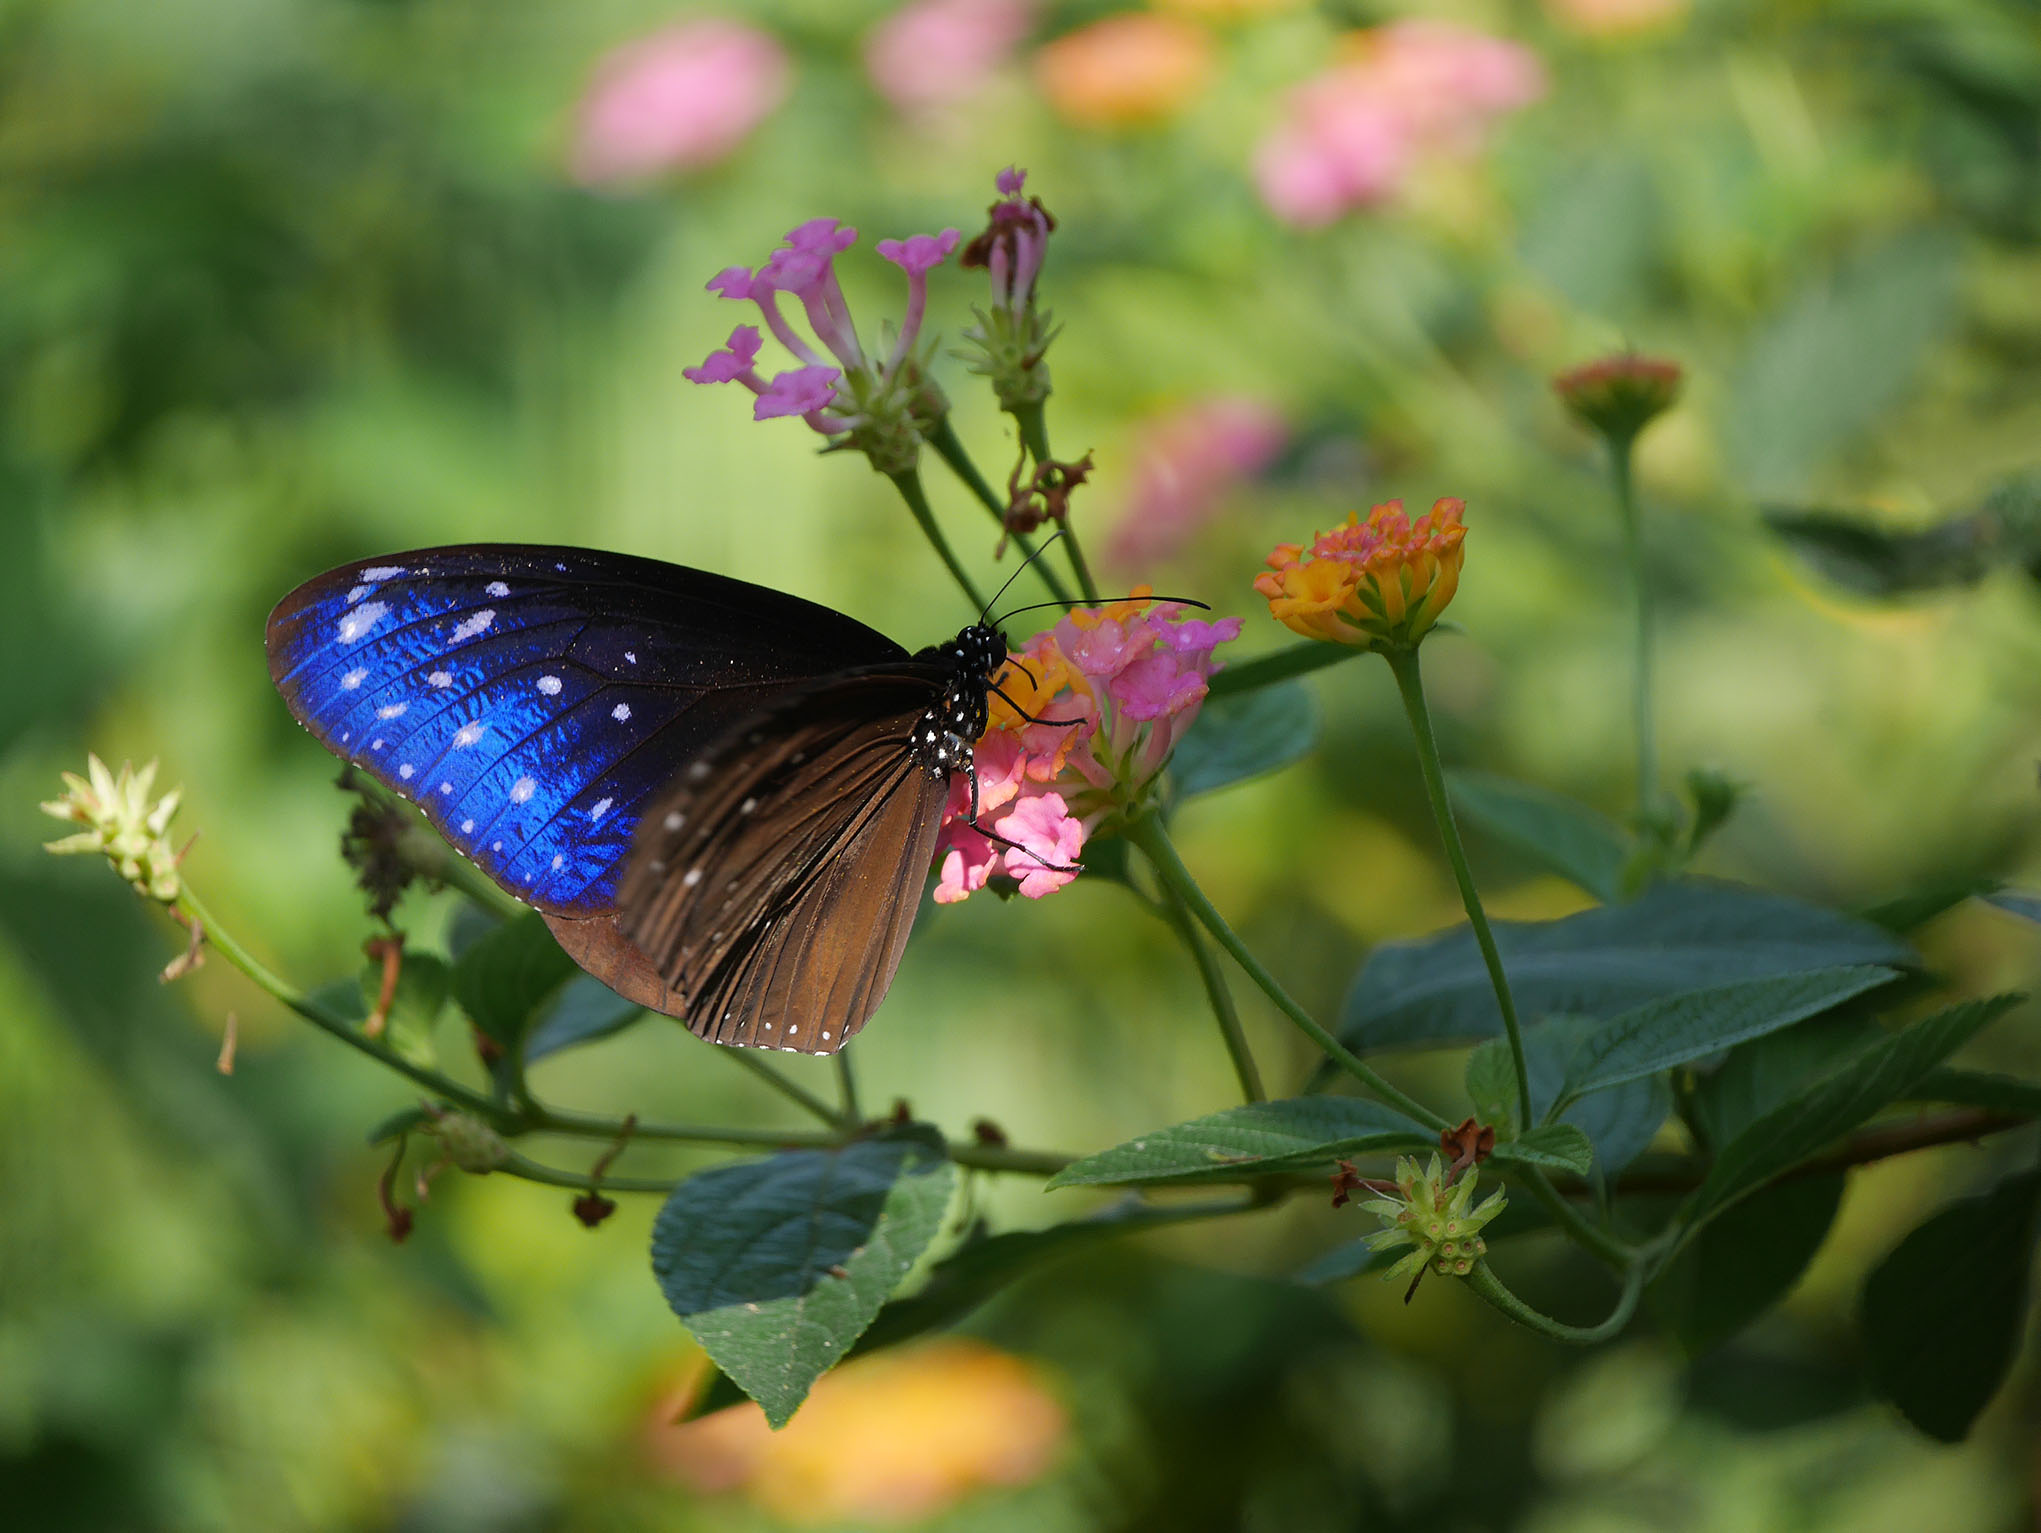 laos-luang-prabang-vlindertuin-striped-blue-crow